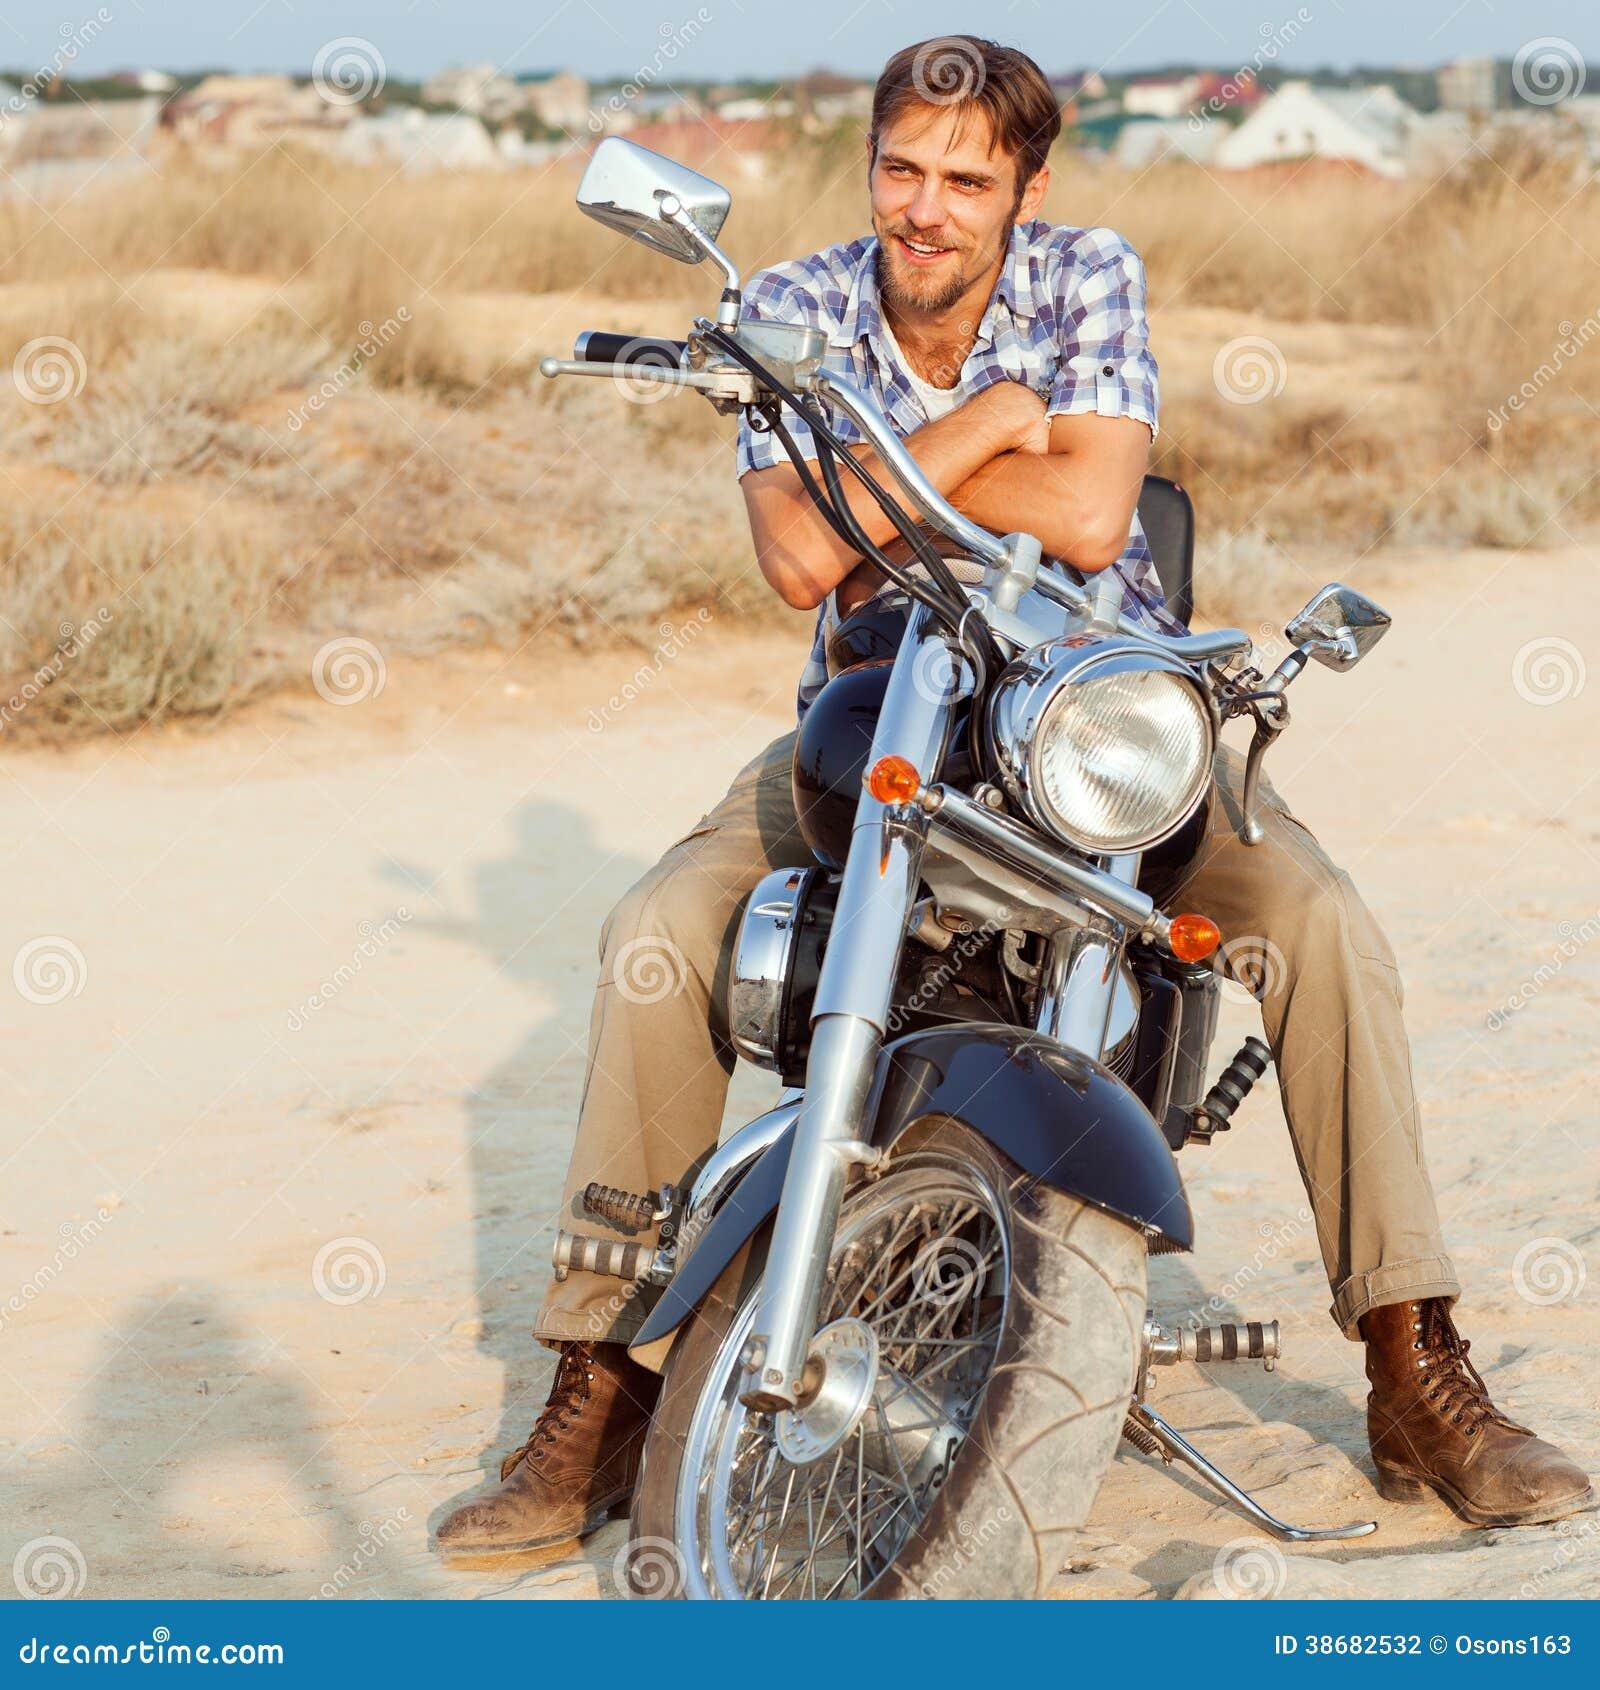 A man is sitting on bike